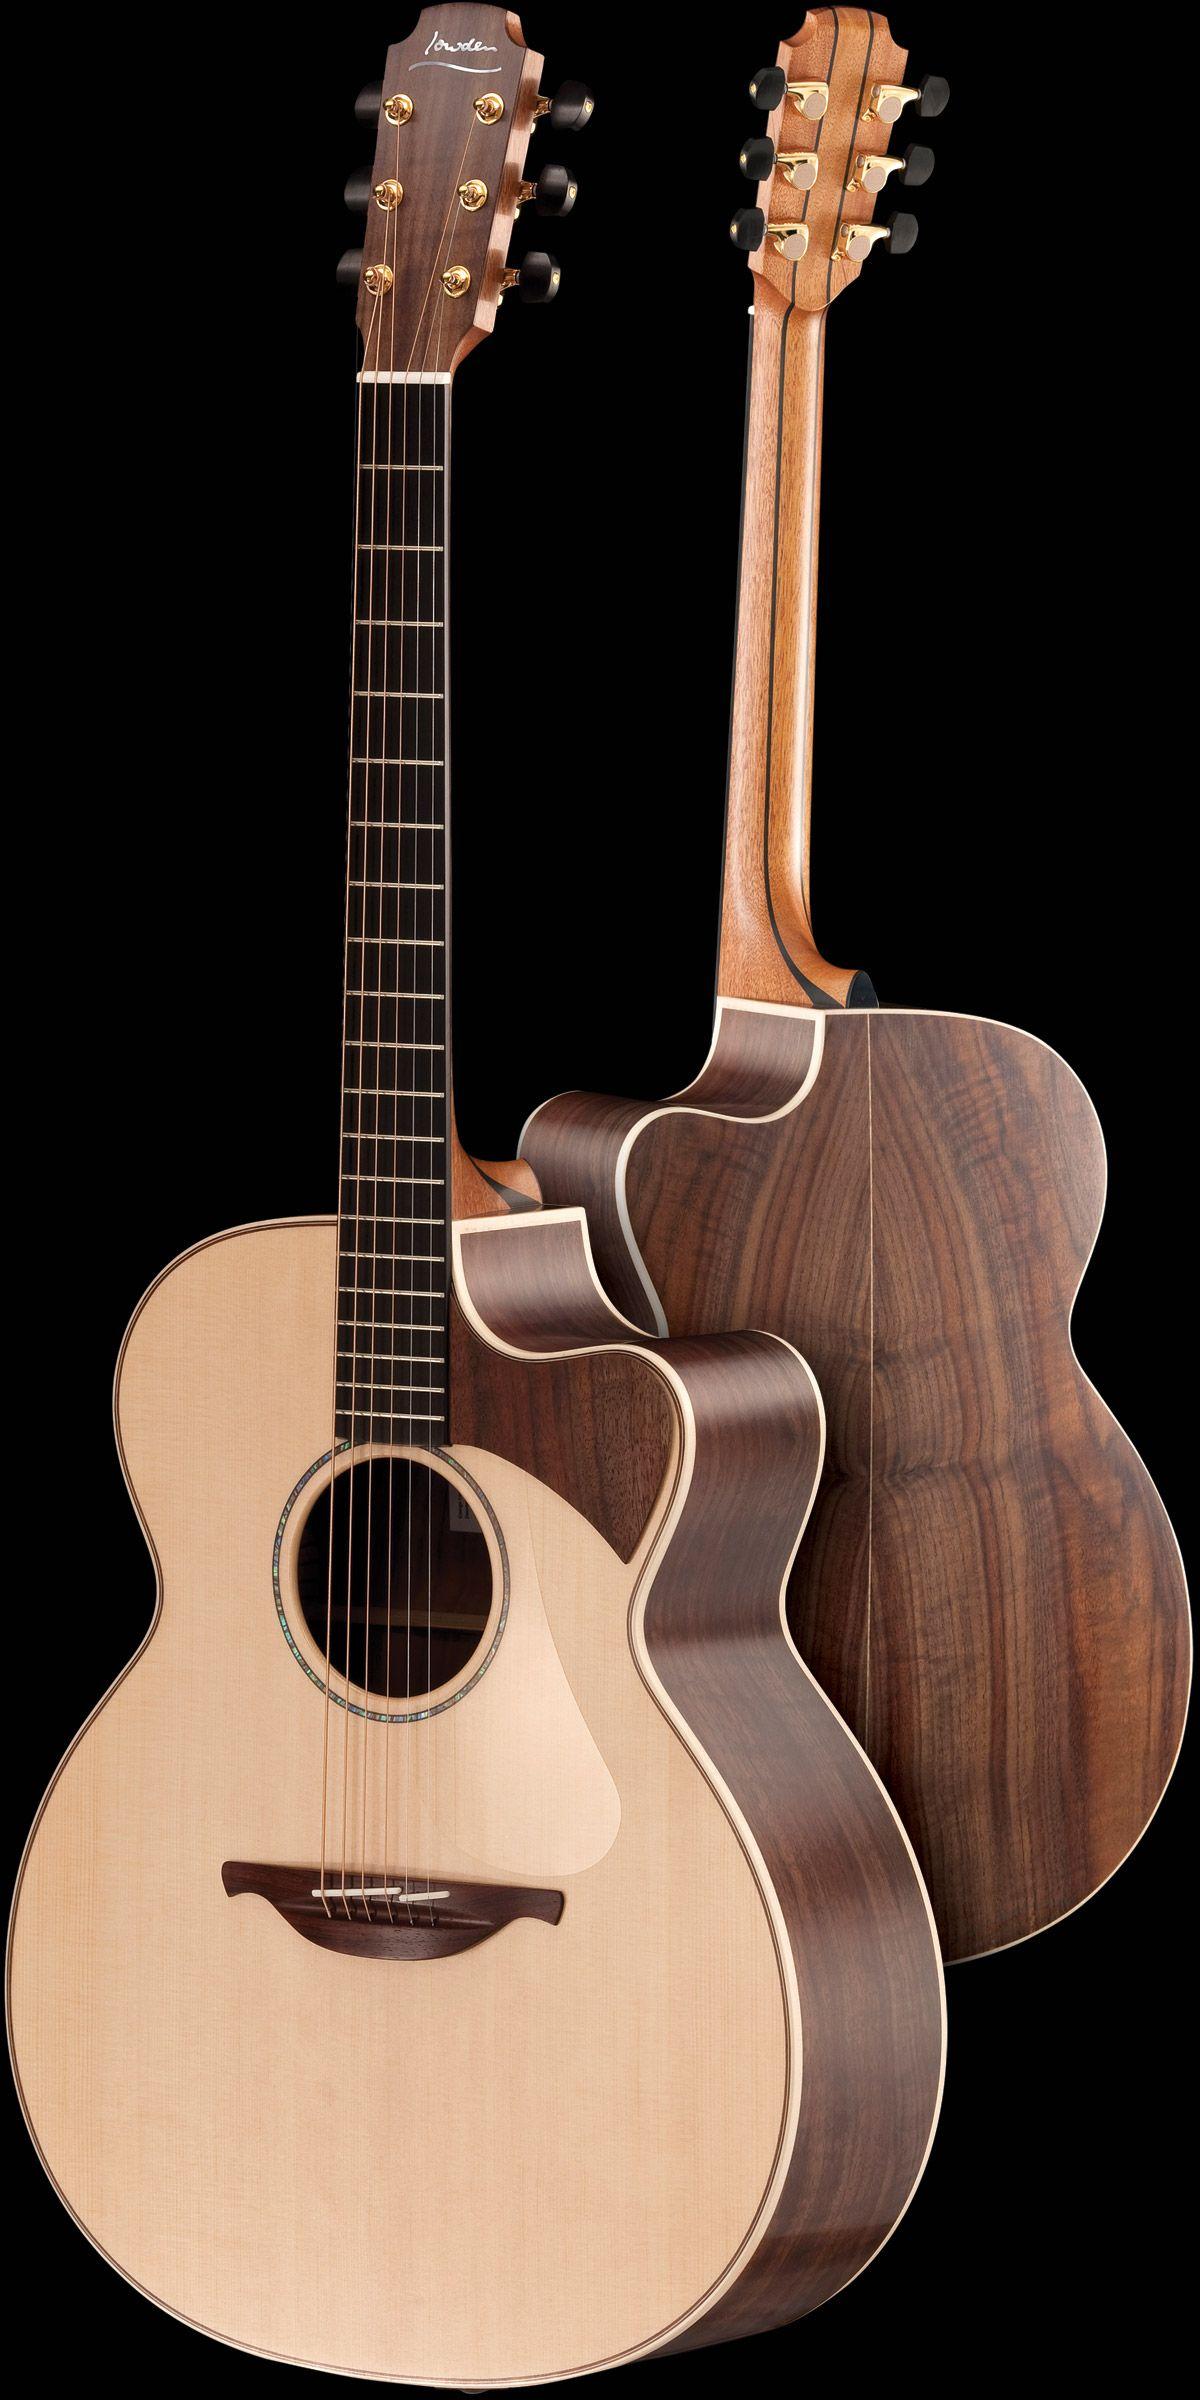 Thomas Leeb Signature Series Lowden Guitars Handmade And Hand Built Acoustic Guitar Ran Acoustic Guitar Photography Acoustic Guitar Custom Acoustic Guitars